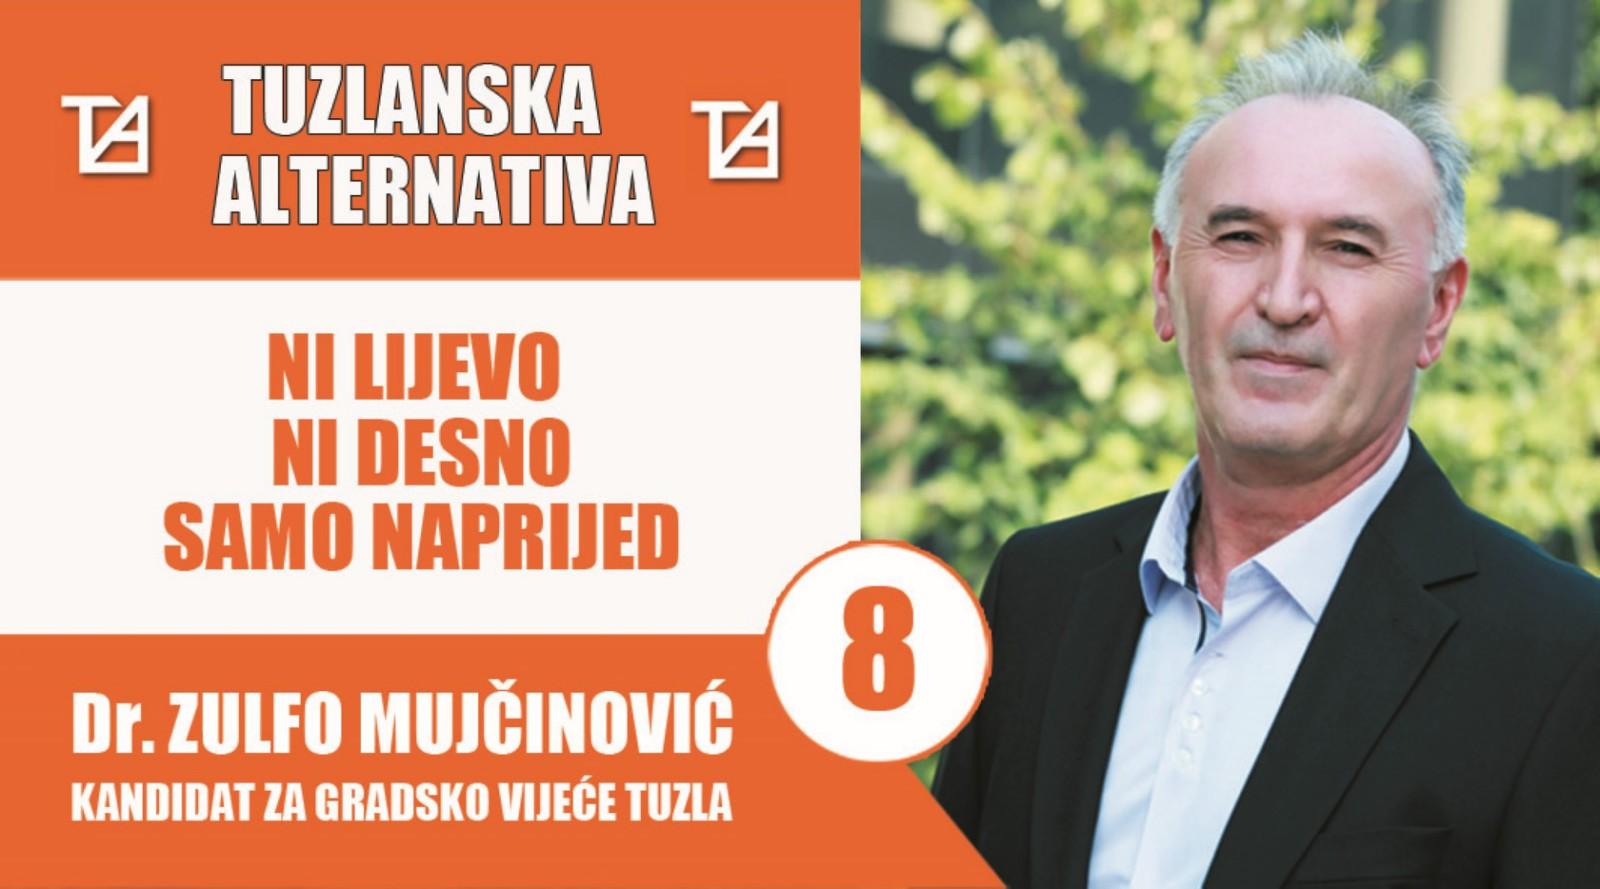 Dr Zulfo Mujčinović